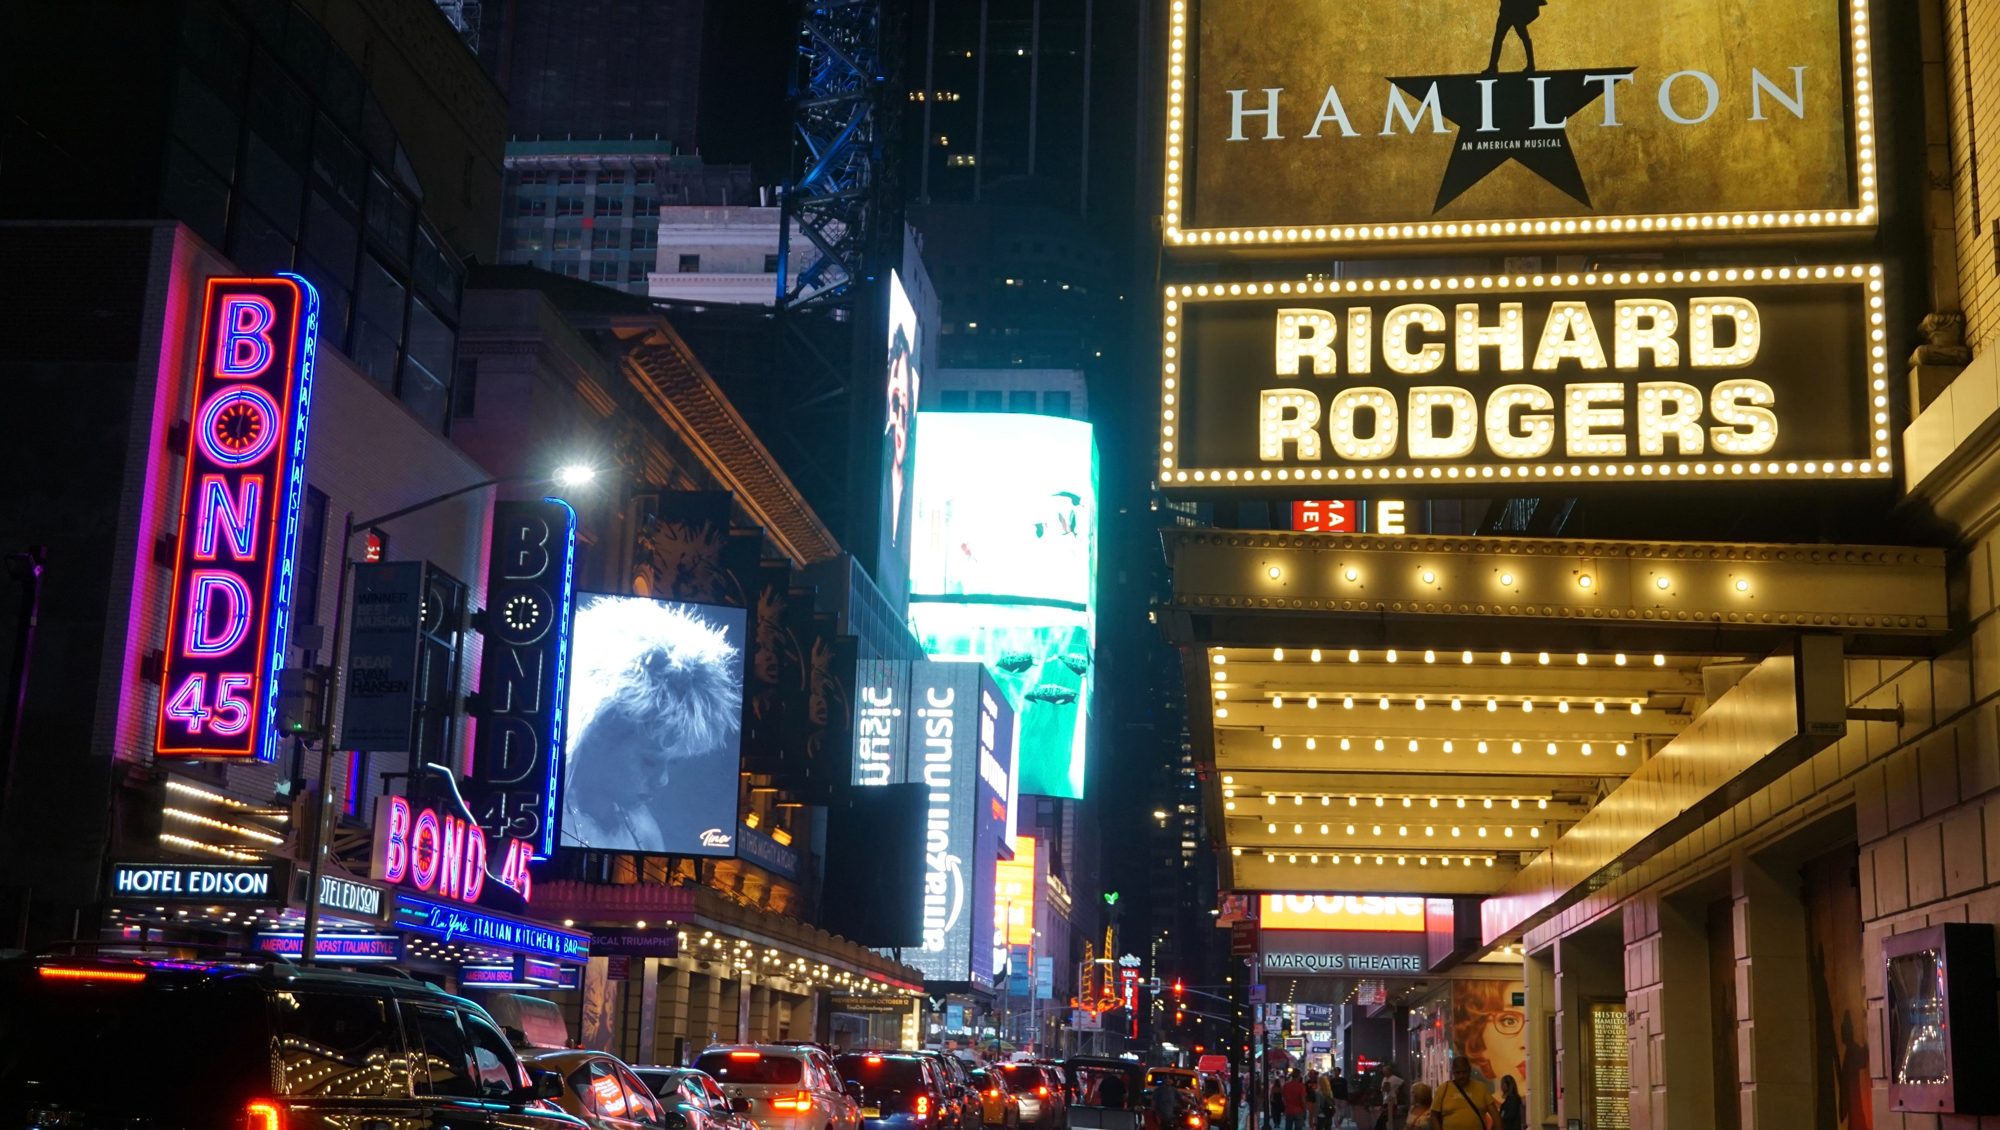 Broadway Showcase